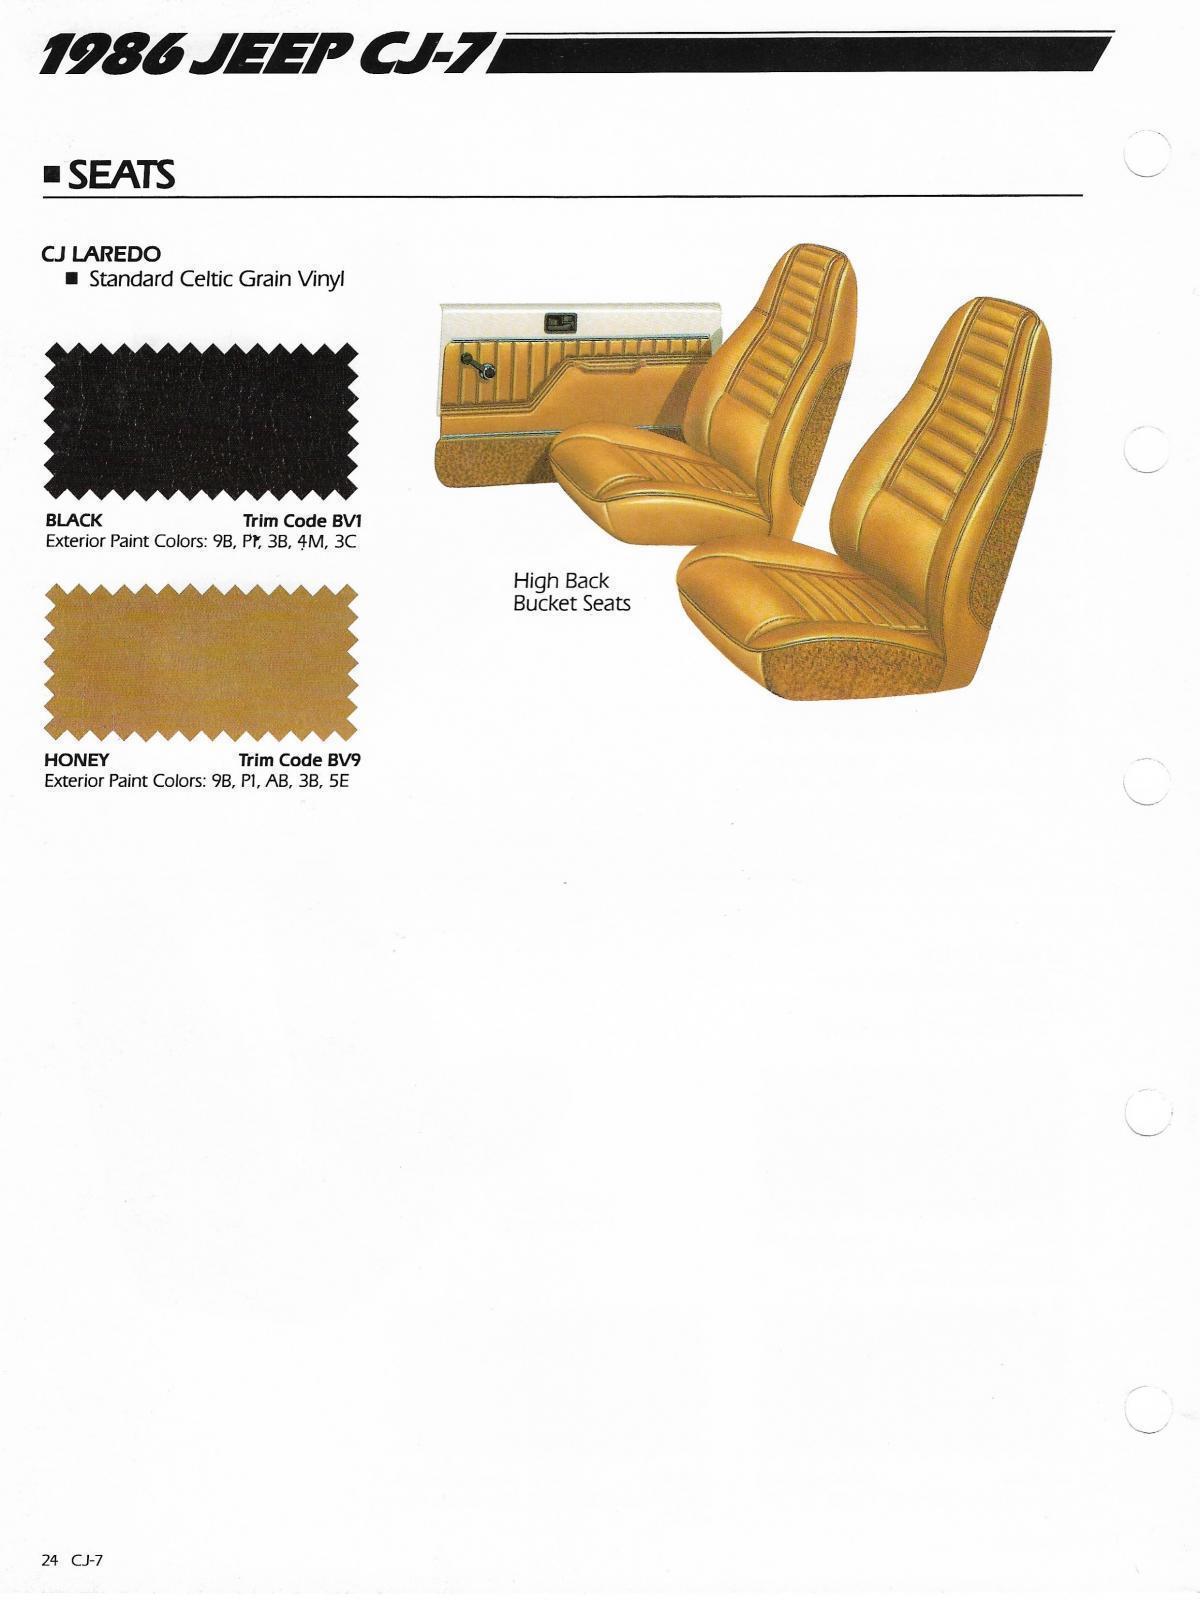 1986-jeep-cj-7-laredo-seats